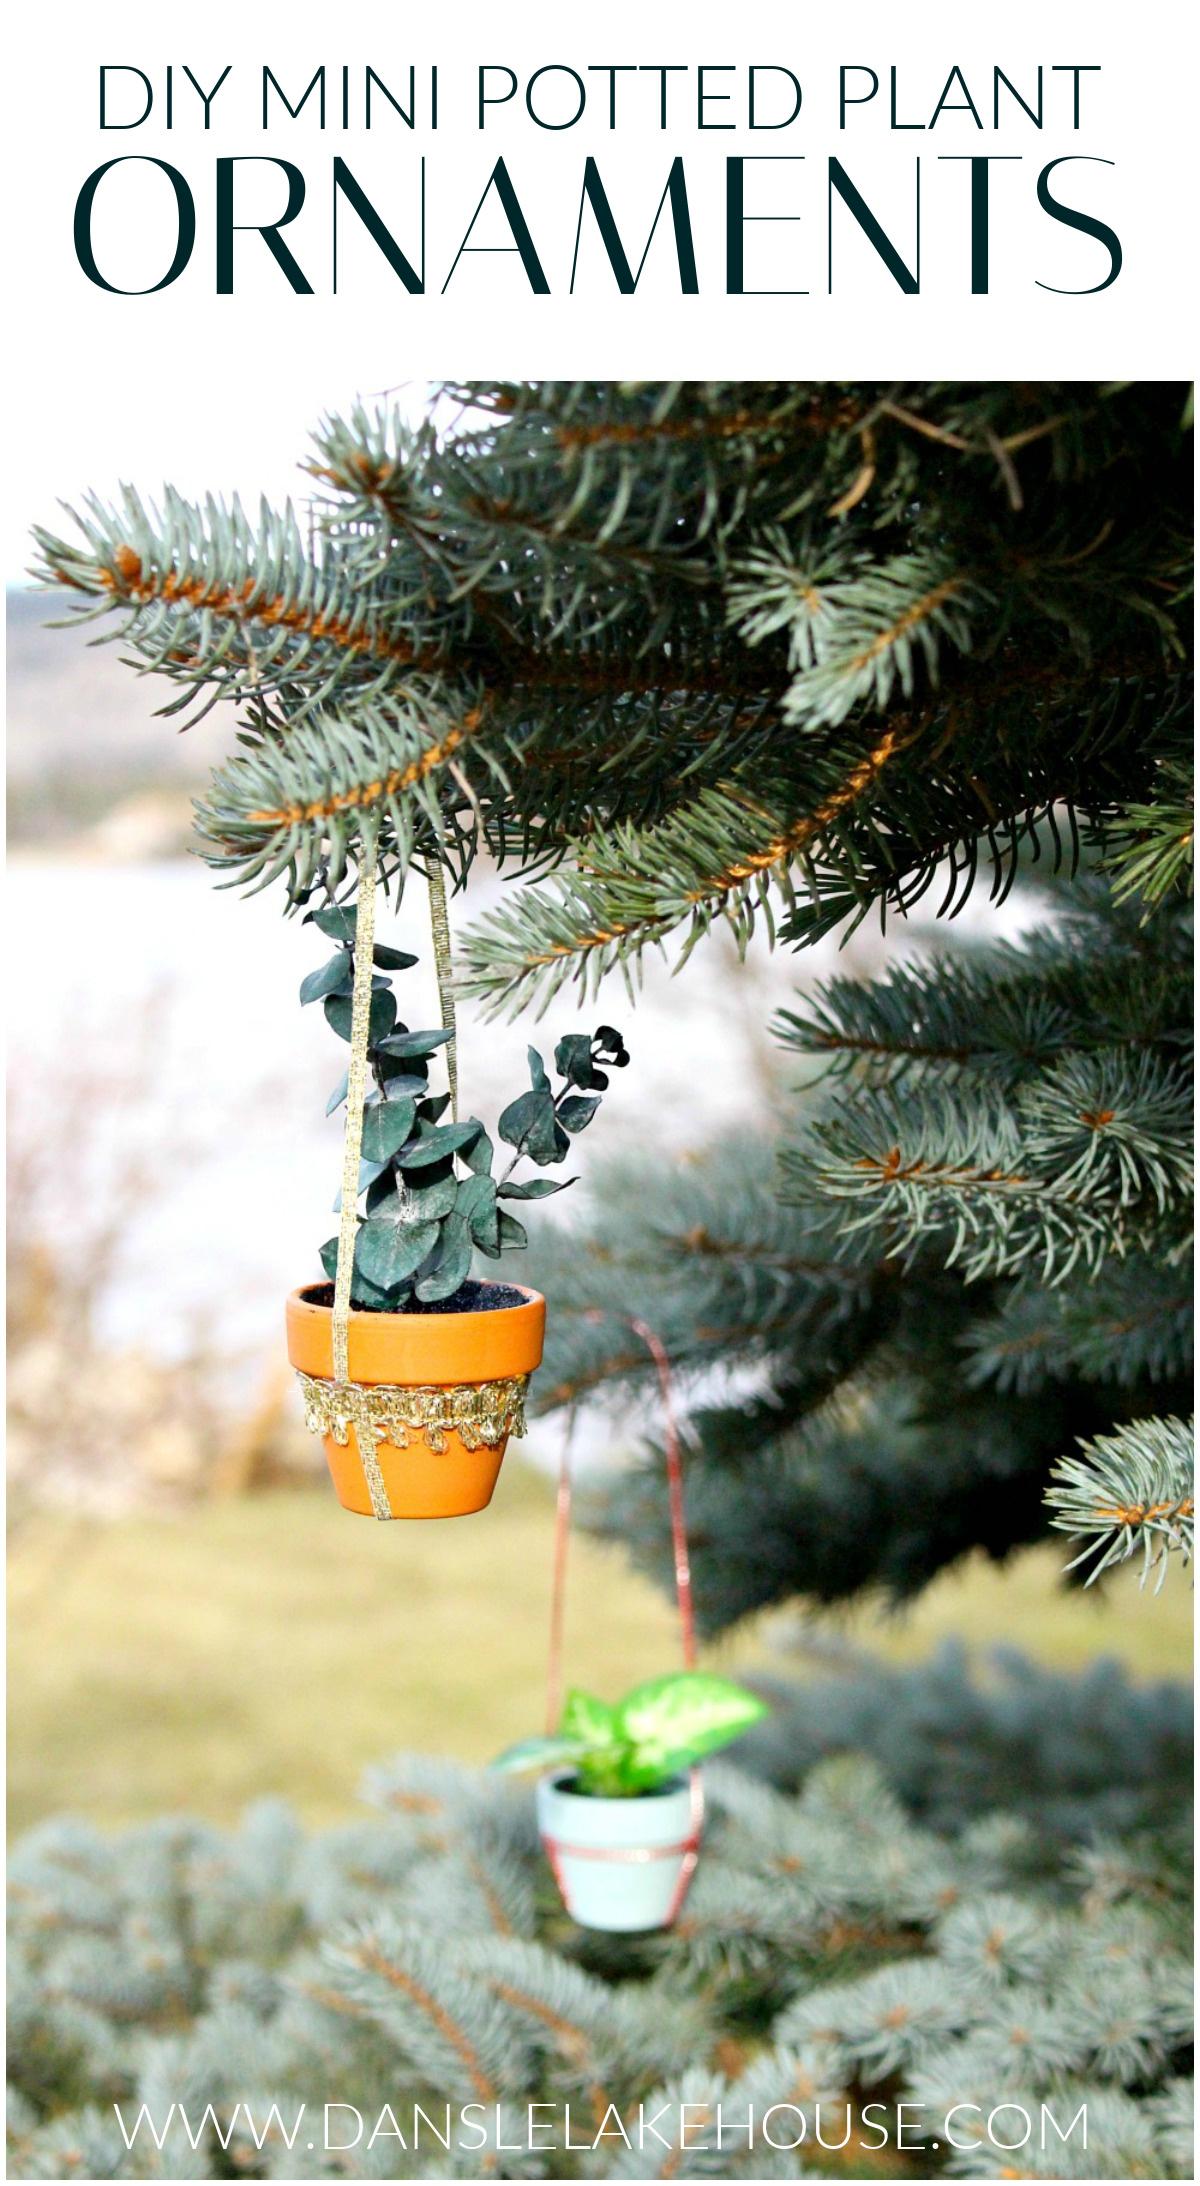 DIY mini potted plant ornaments